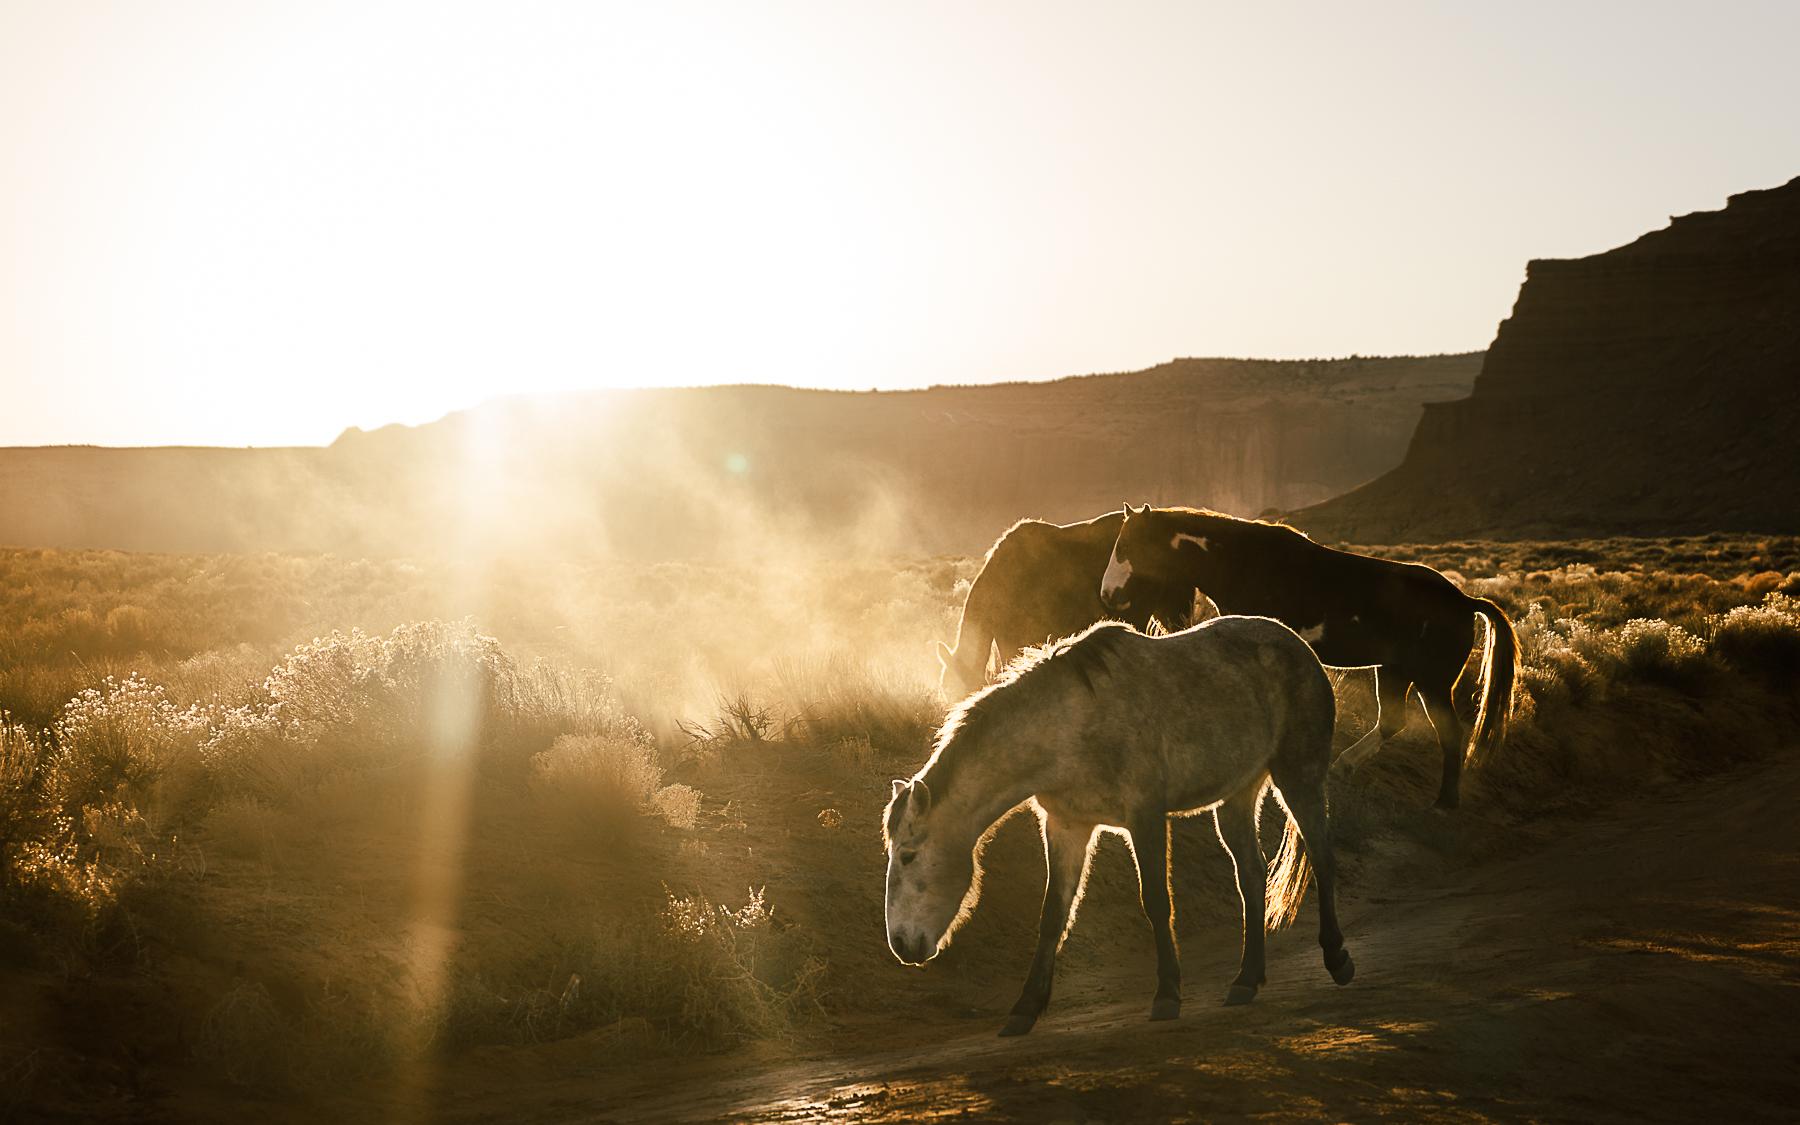 Wildhorse5.jpg